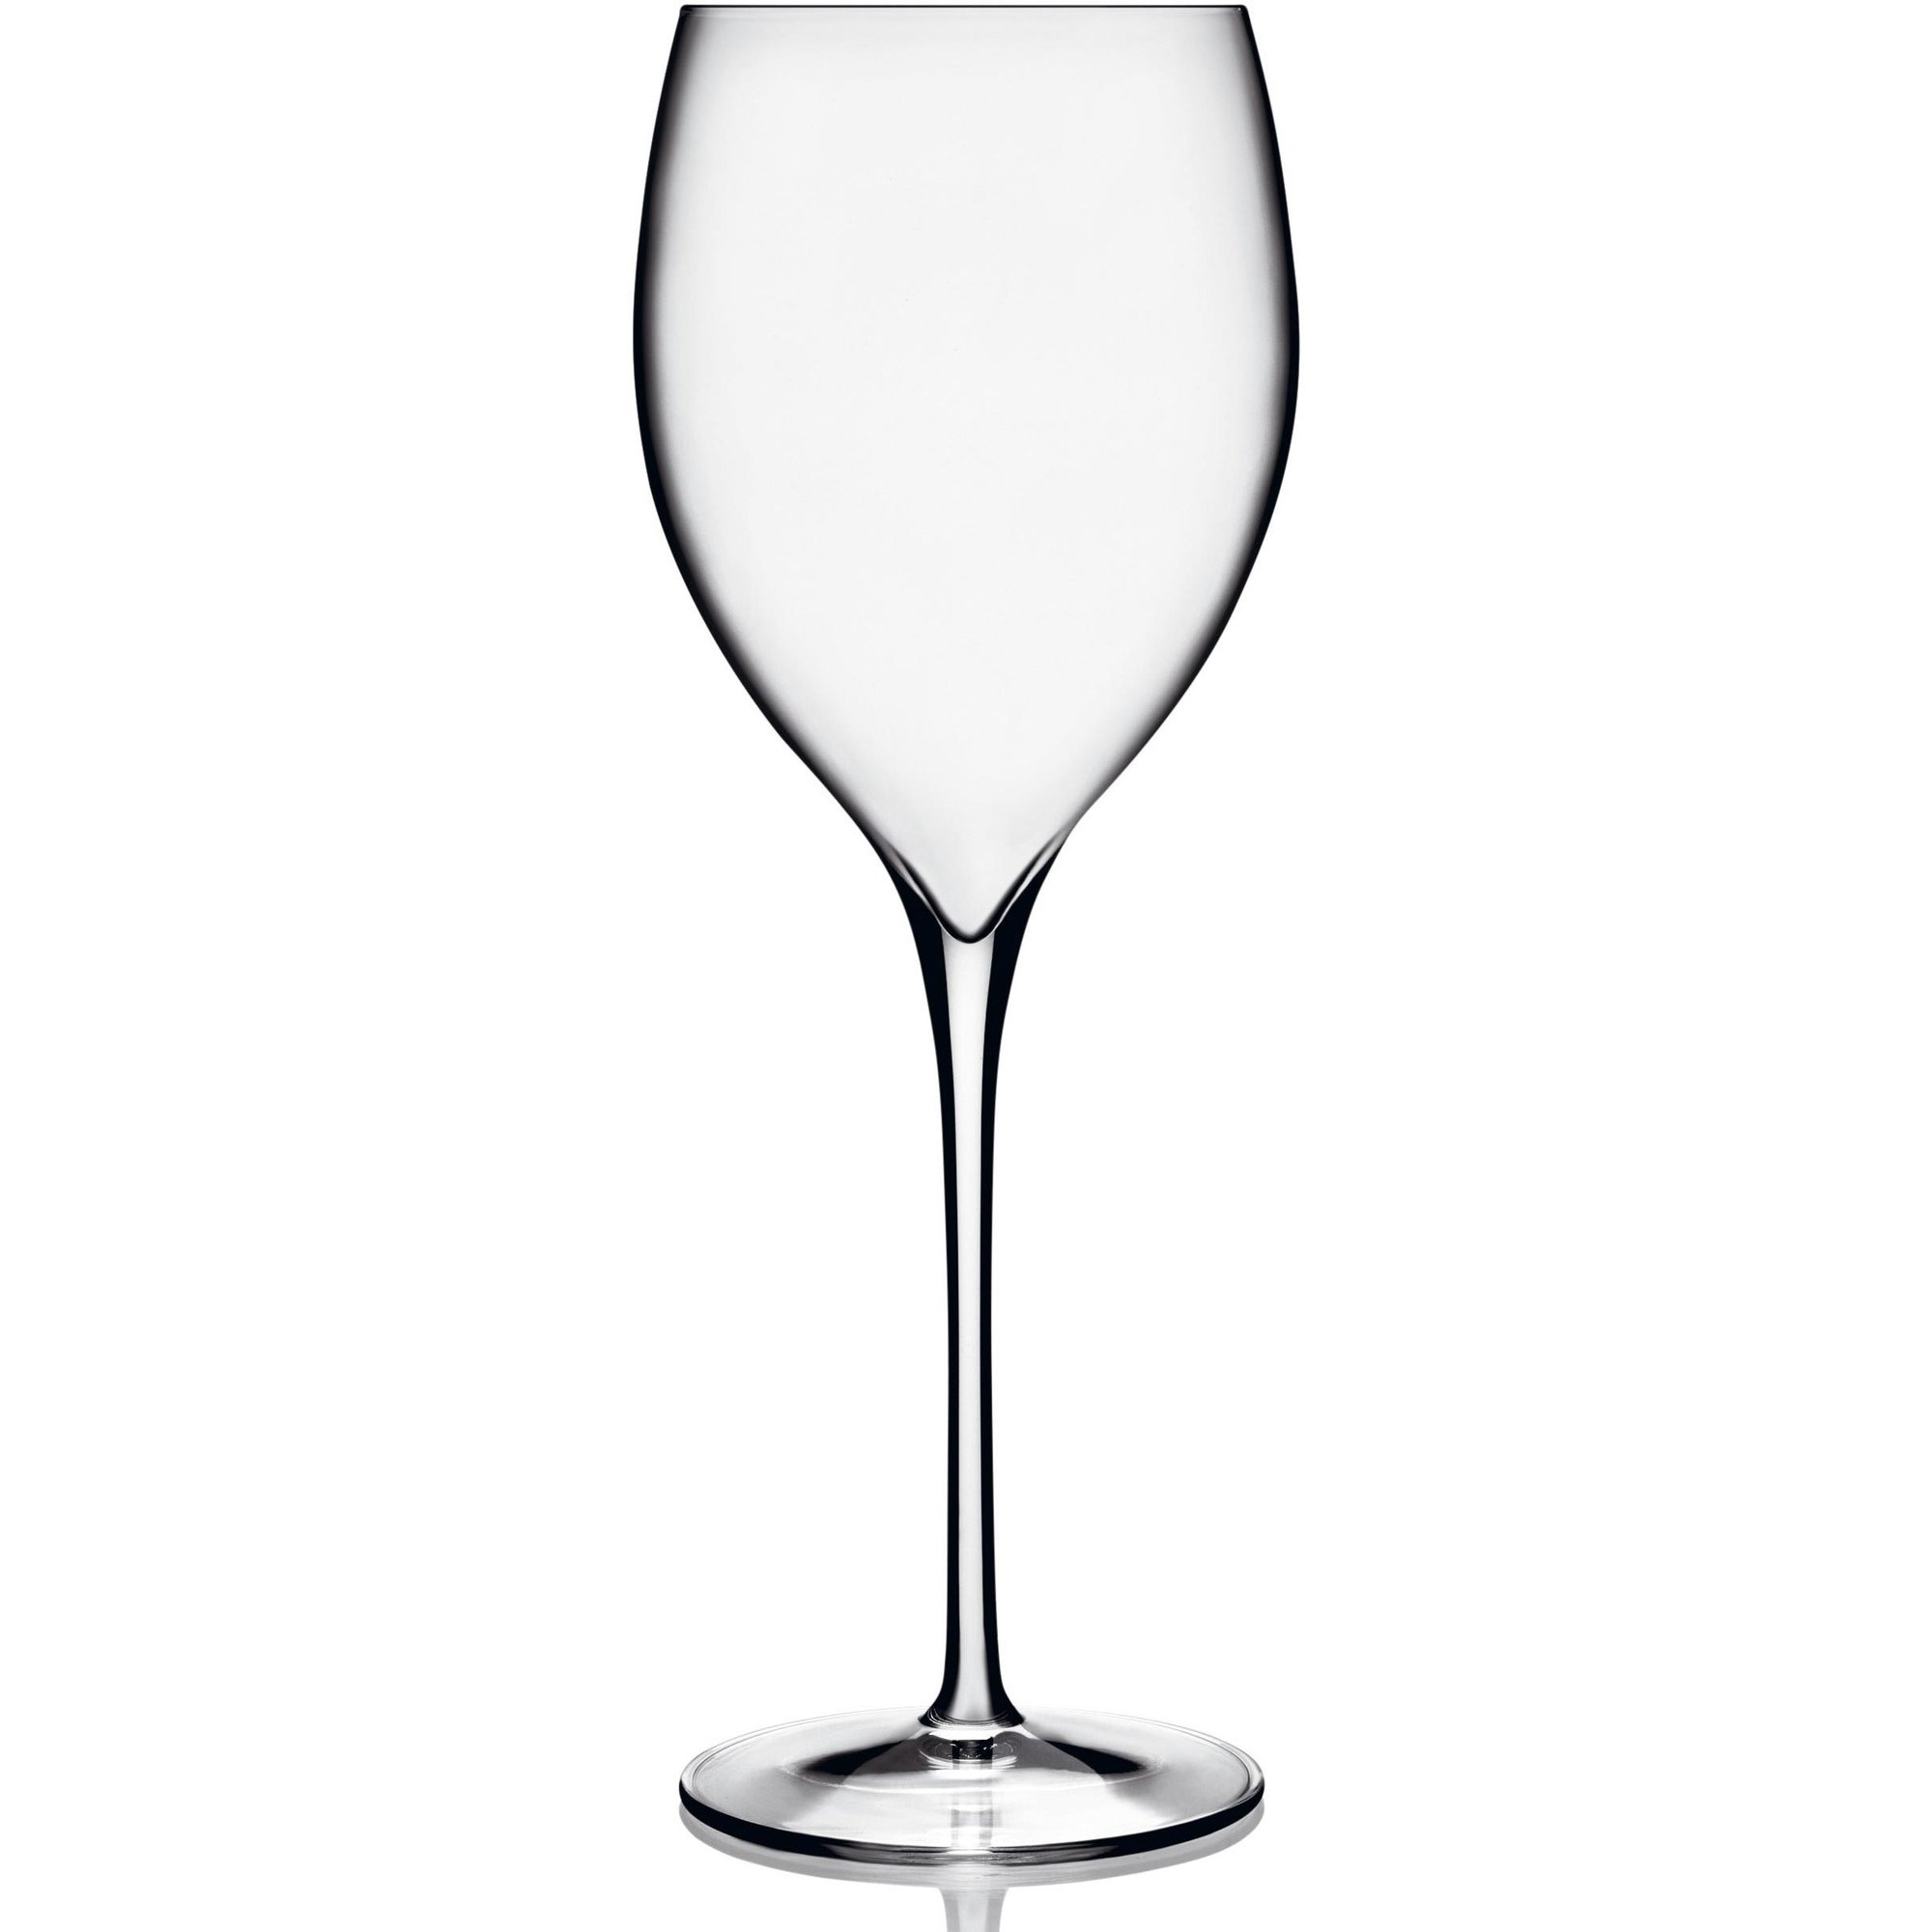 Luigi Bormioli Accademia Magnifico 2 stk. Medium Rödvinsglas